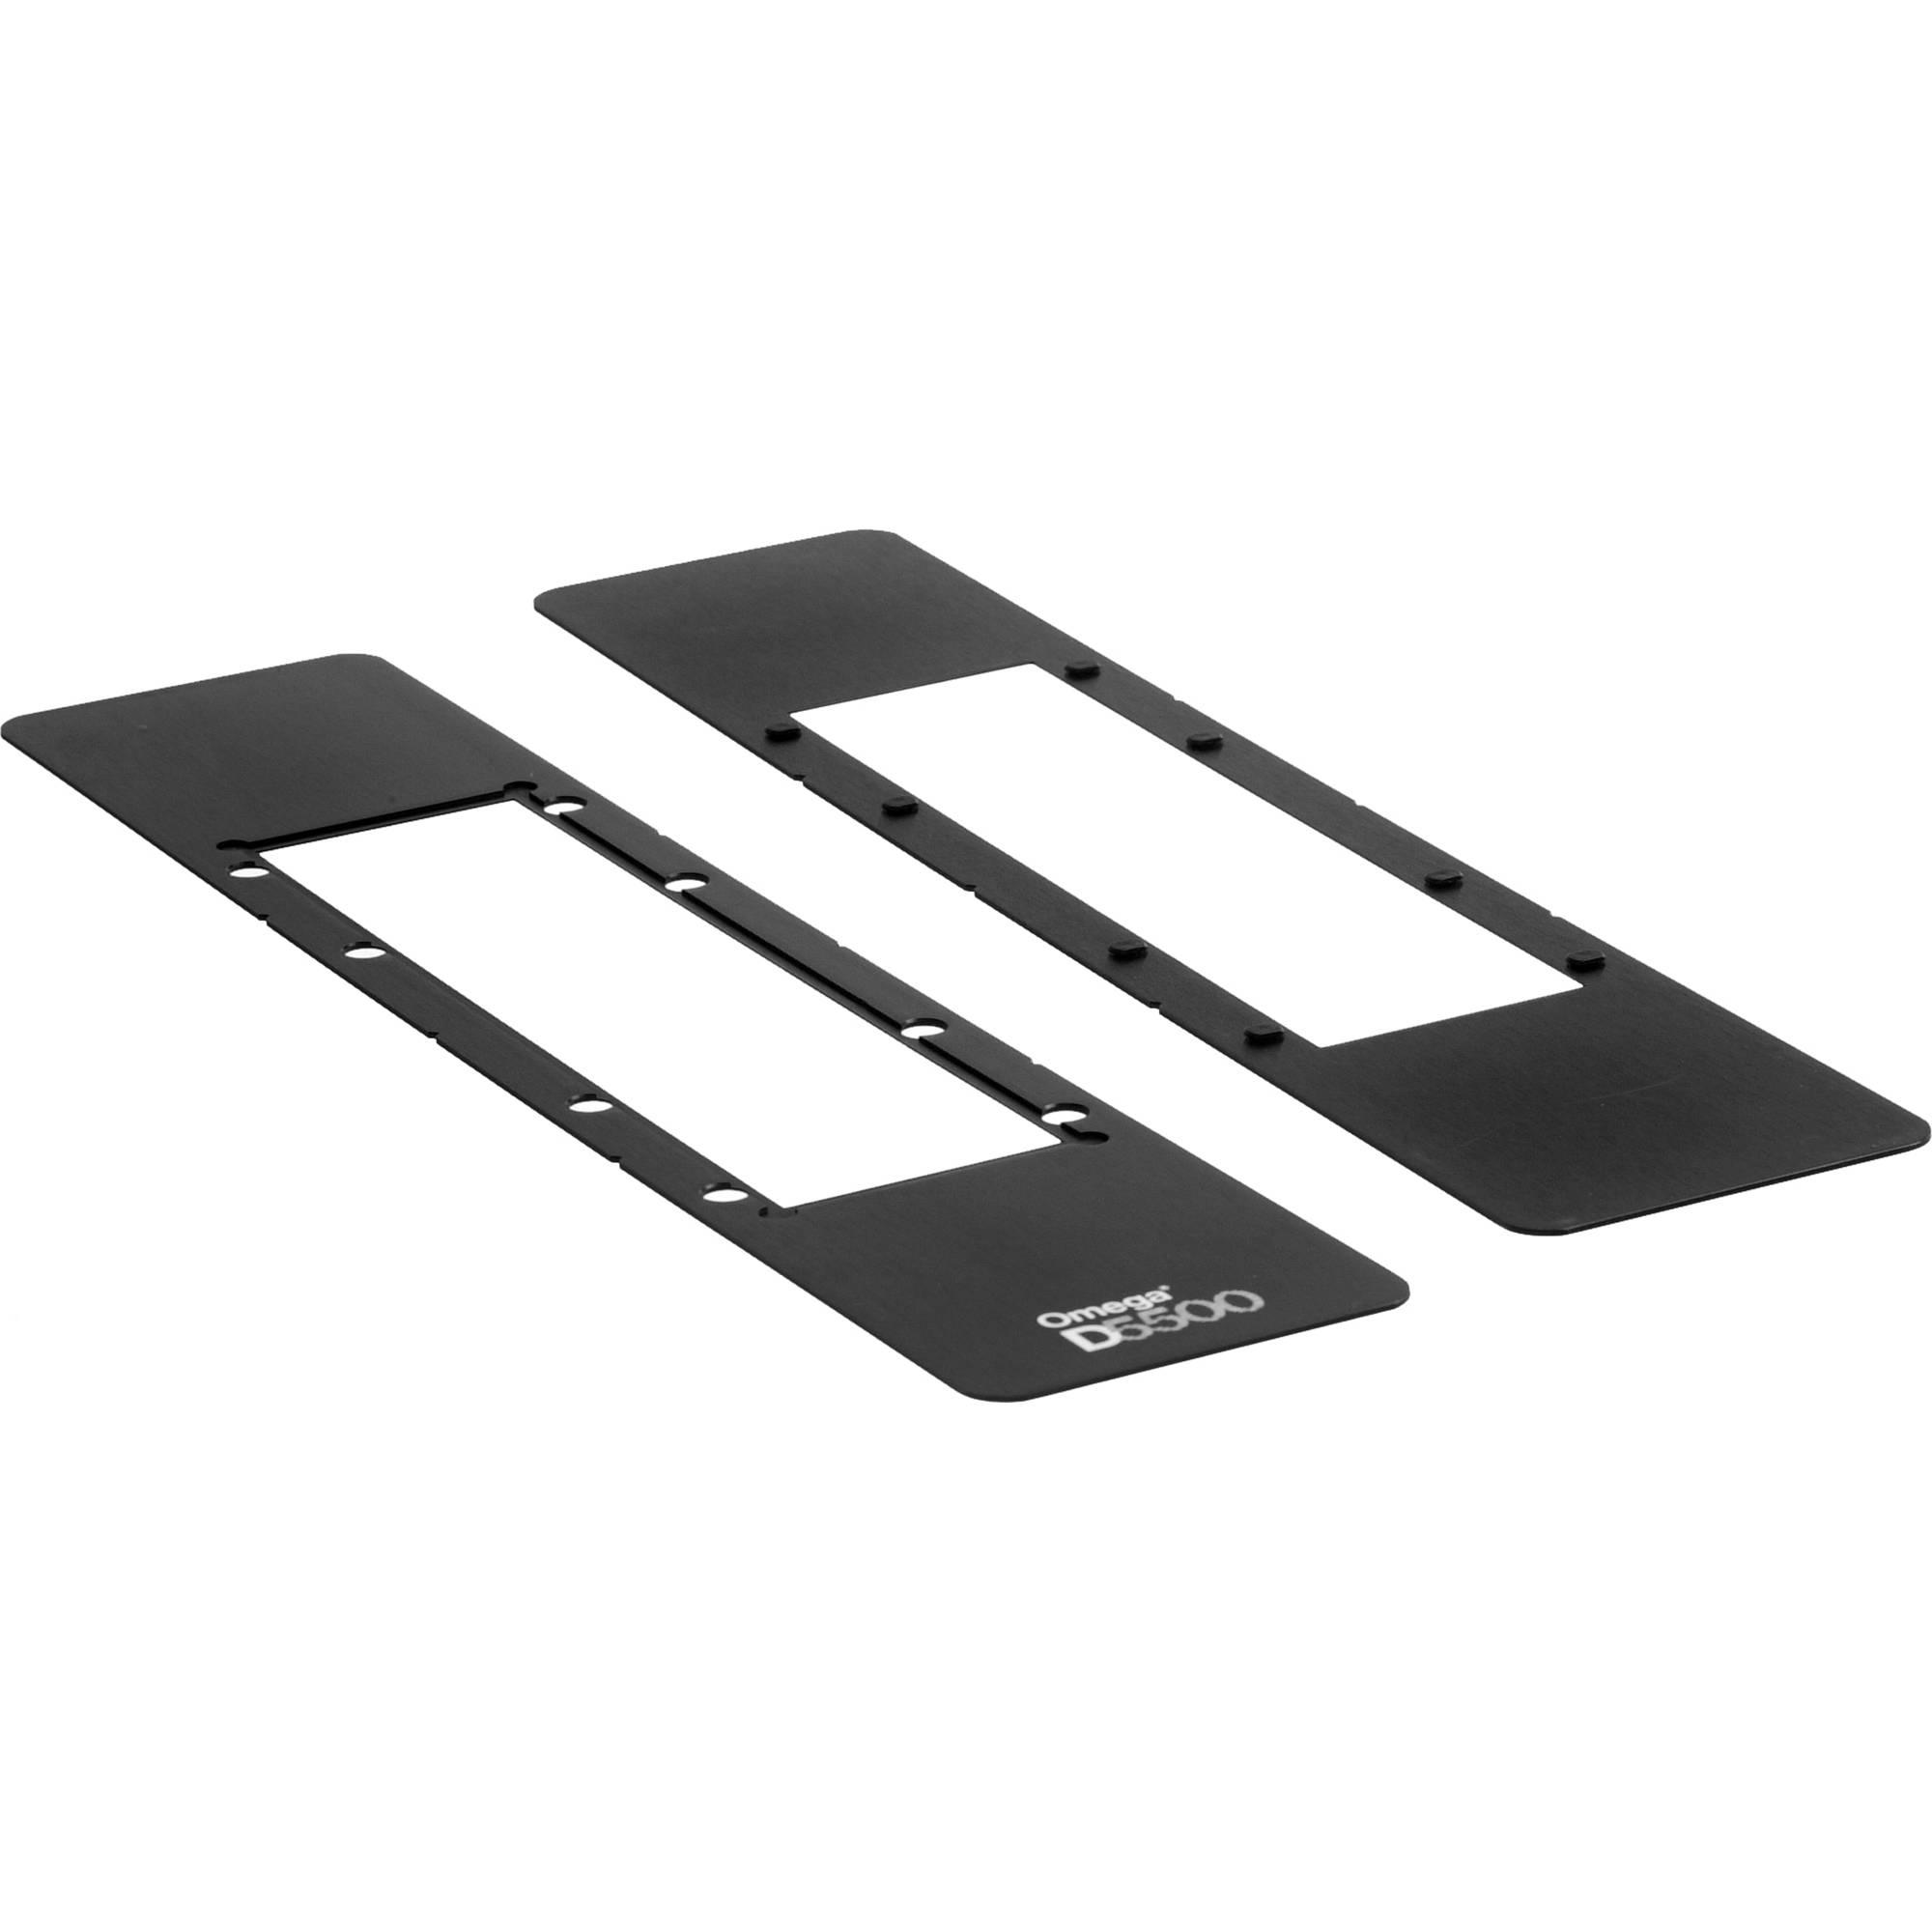 Omega 6x7cm 3-Frame Film Strip Mask Set 423962 B&H Photo Video